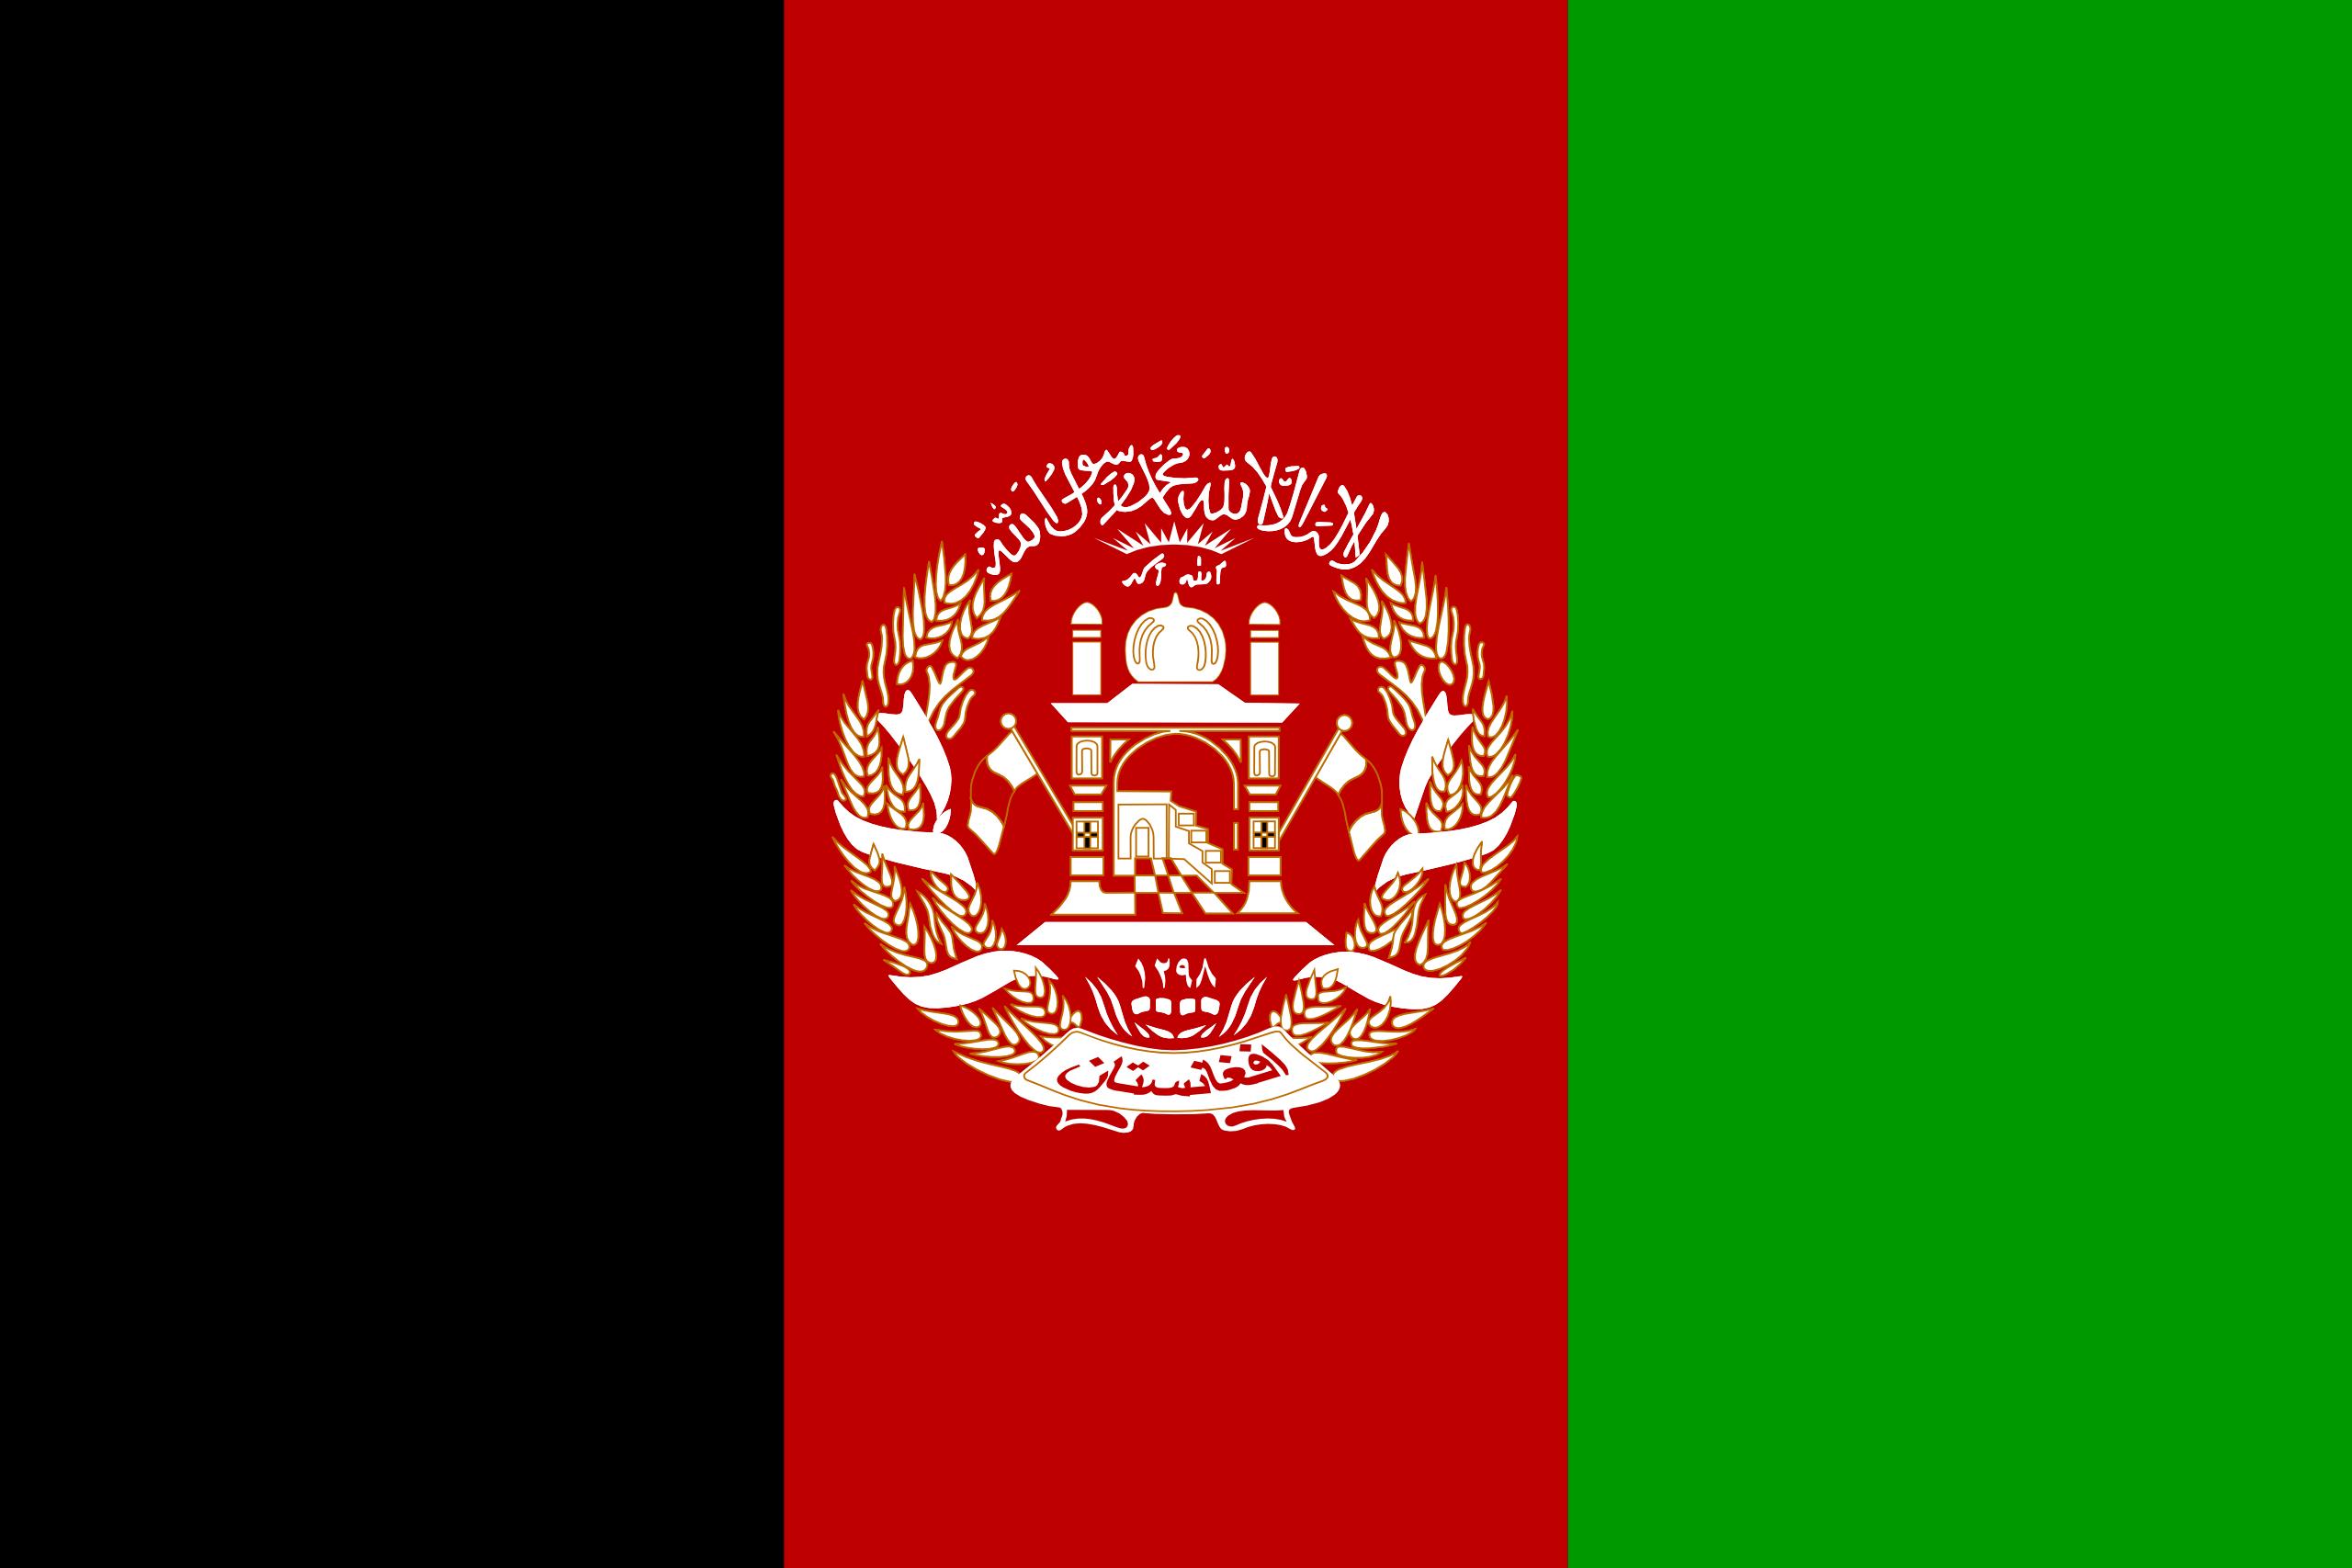 Afghanistan, paese, emblema, logo, simbolo - Sfondi HD - Professor-falken.com